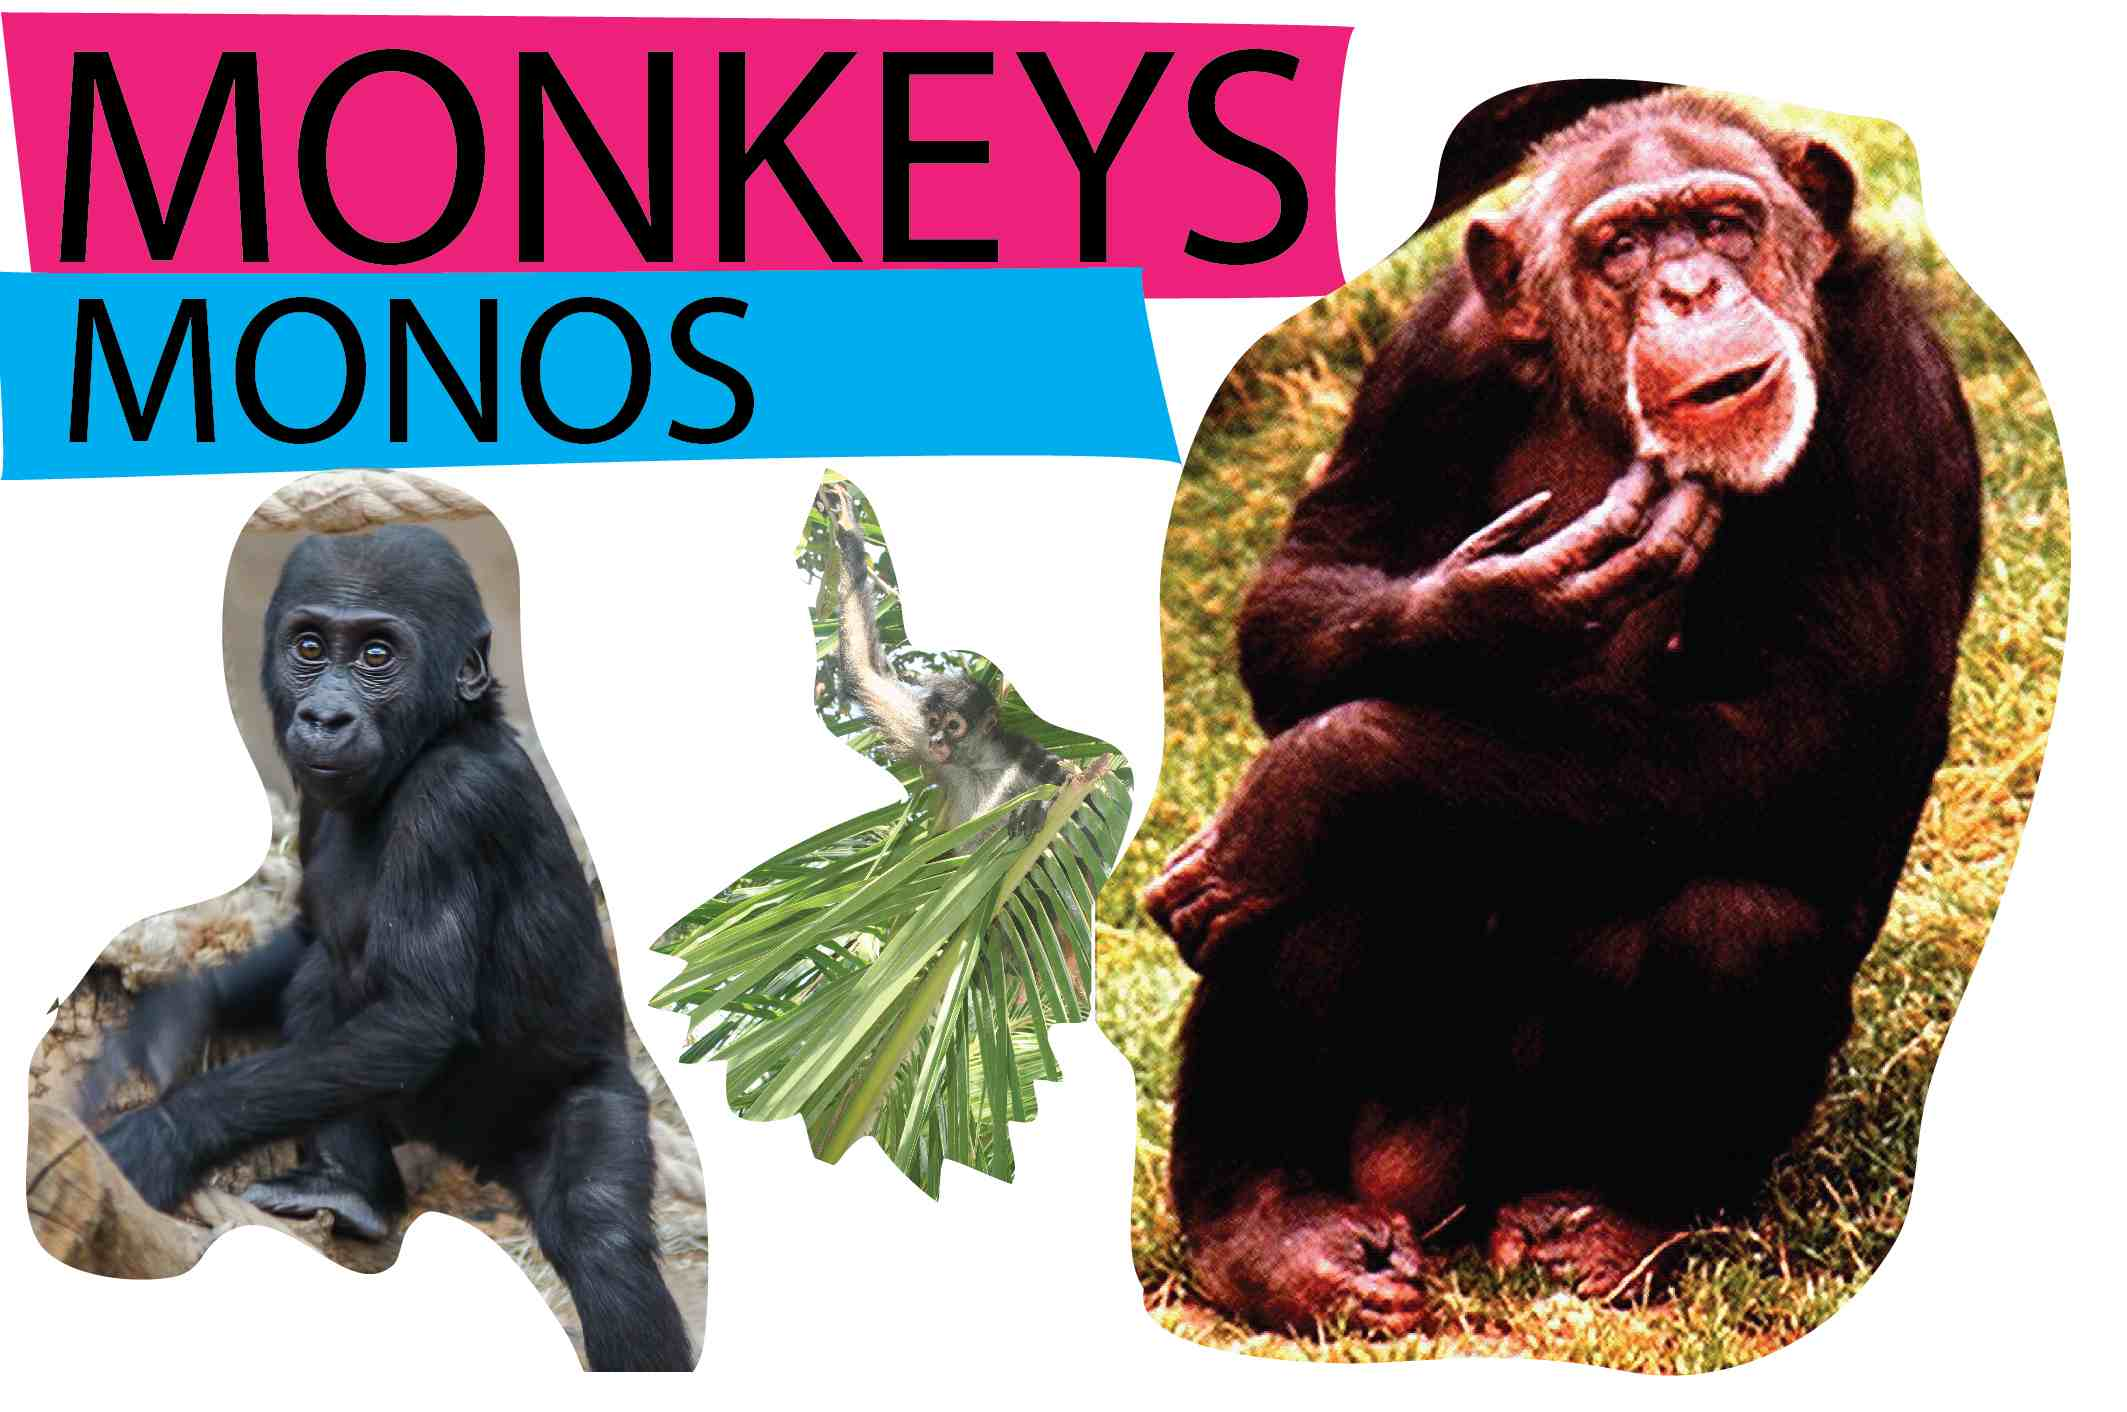 monkeys-11.jpg